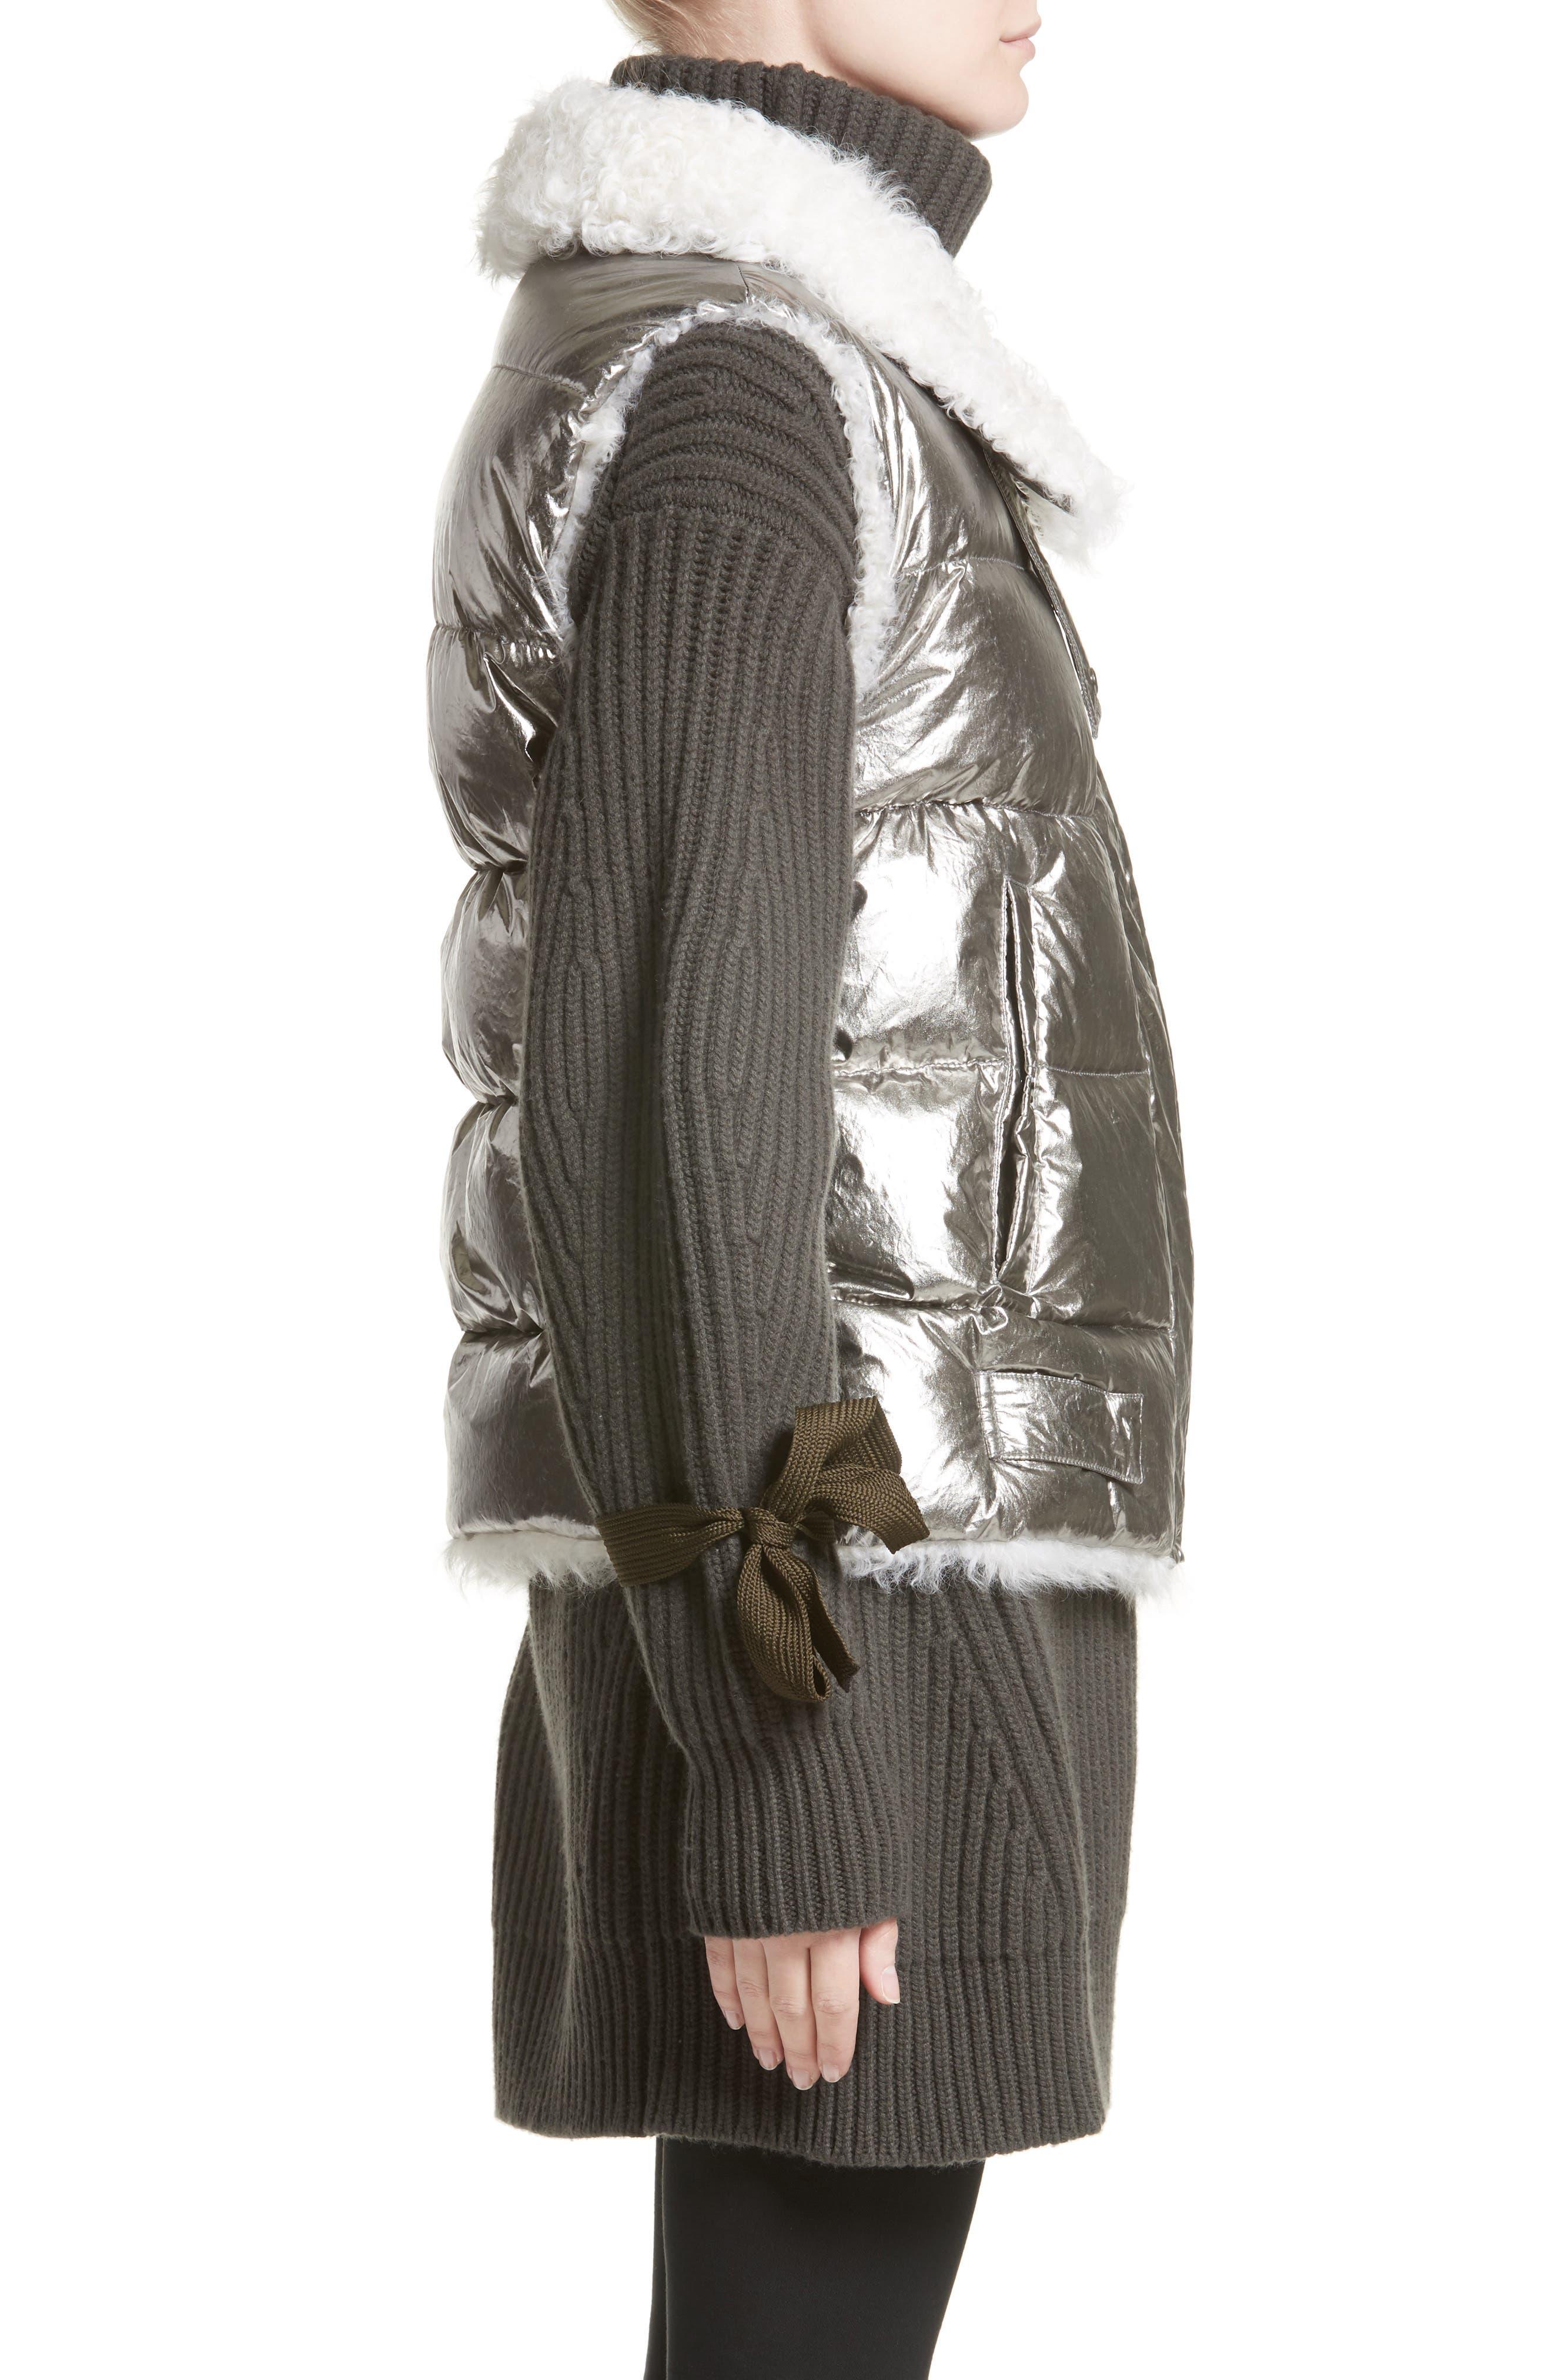 Kerria Metallic Down Vest with Genuine Shearling Trim,                             Alternate thumbnail 3, color,                             040